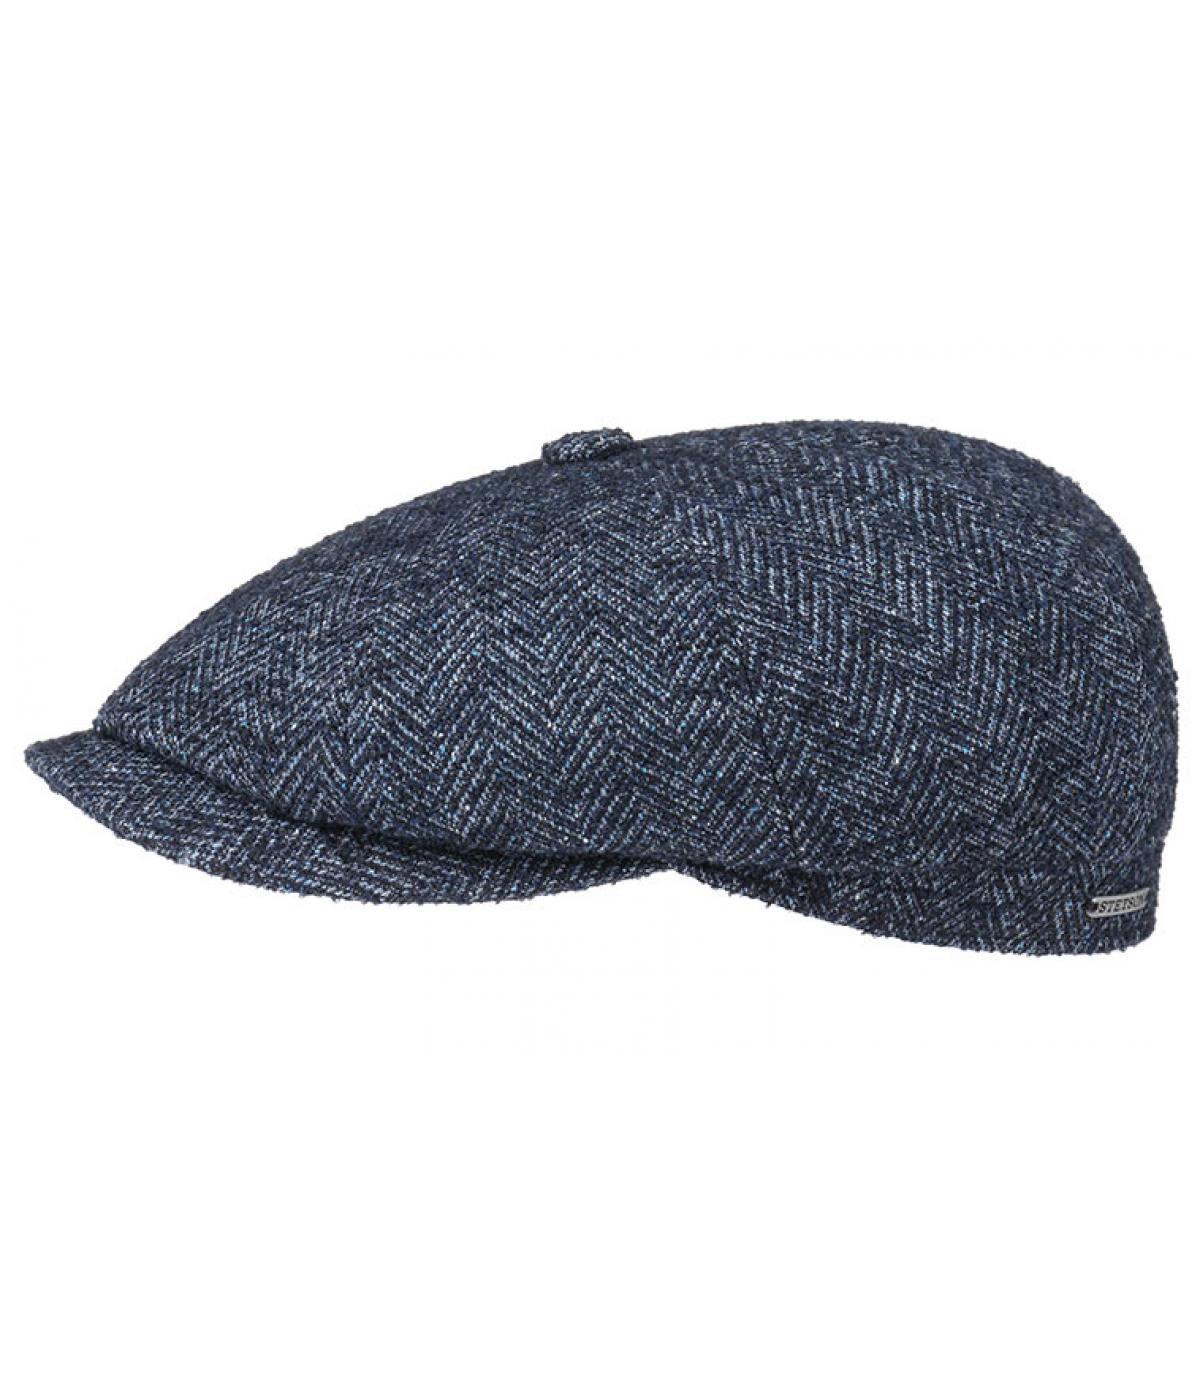 Details Hatteras Virgin Wool blue herringbone - Abbildung 2